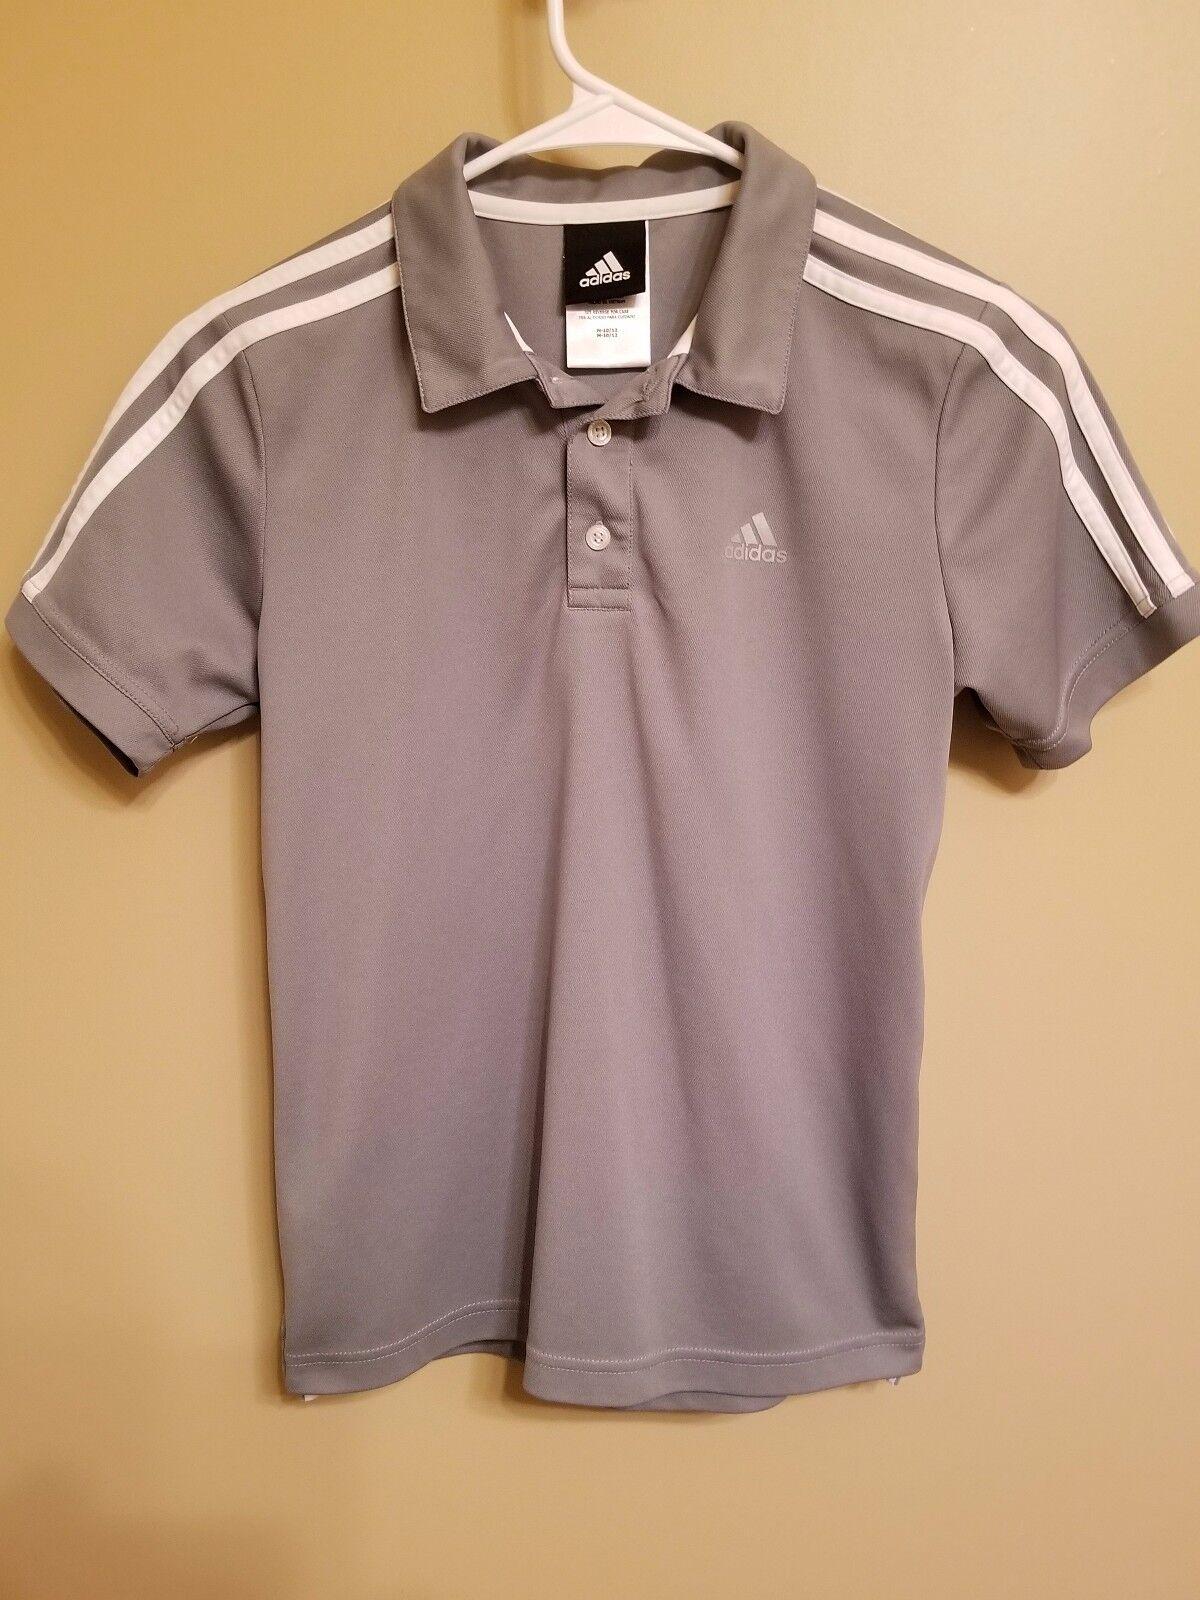 Adidas Golf női s / s szürke póló mérete X Kicsi